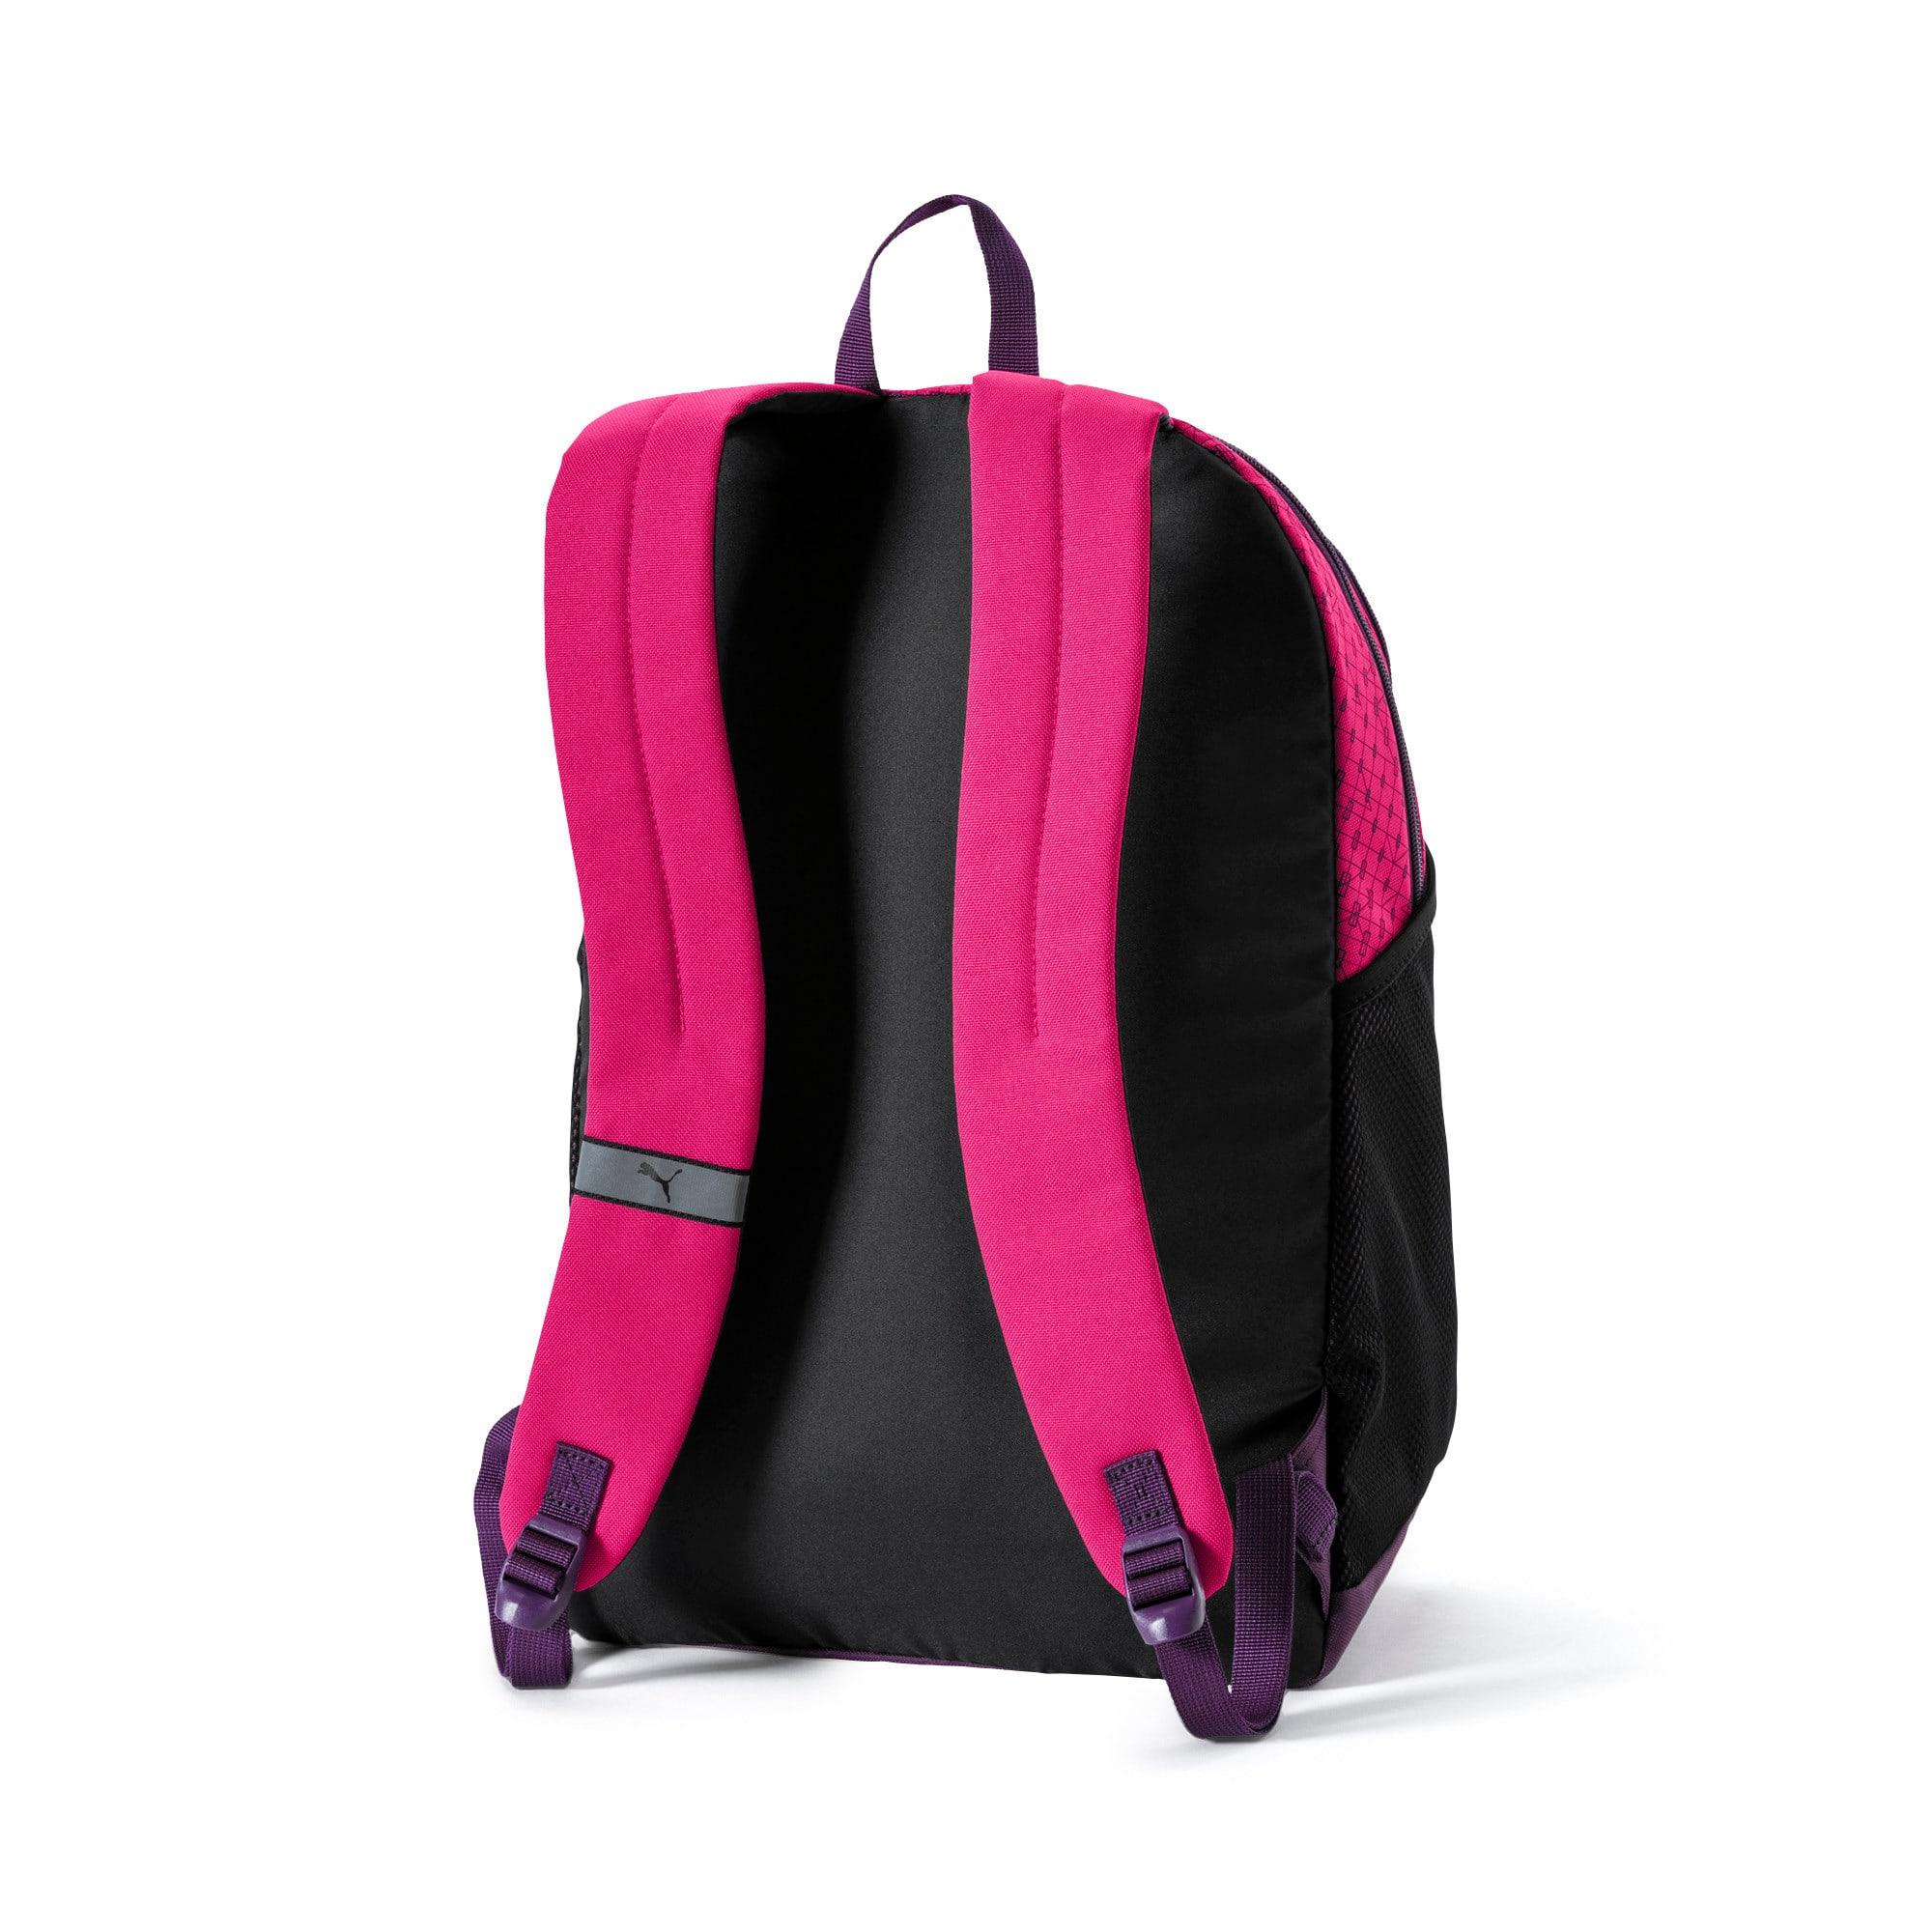 Thumbnail 2 of Beta Backpack, Beetroot Purple-Shadow Purpl, medium-IND